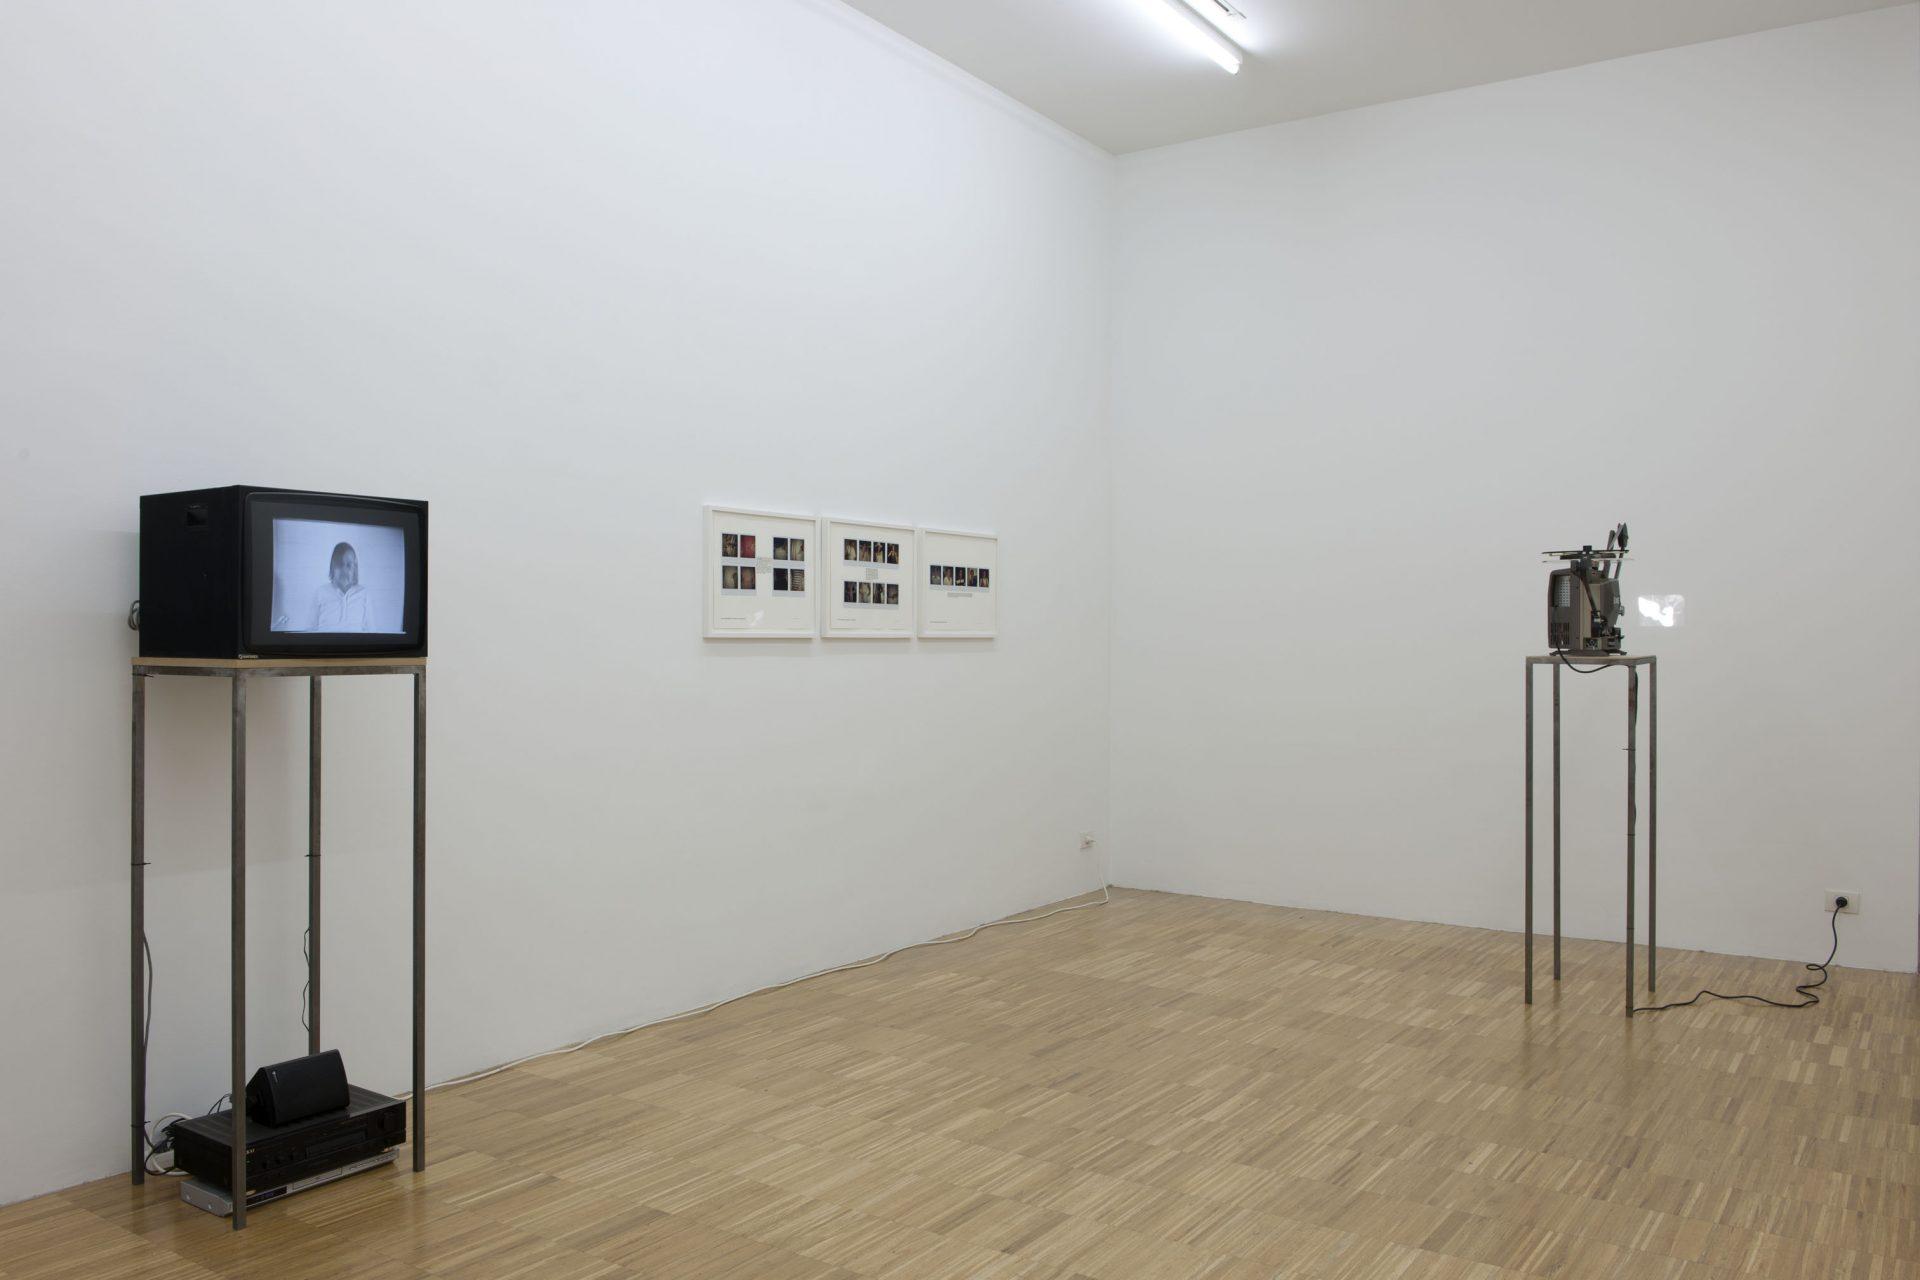 Installation view at Jan Mot, 2012